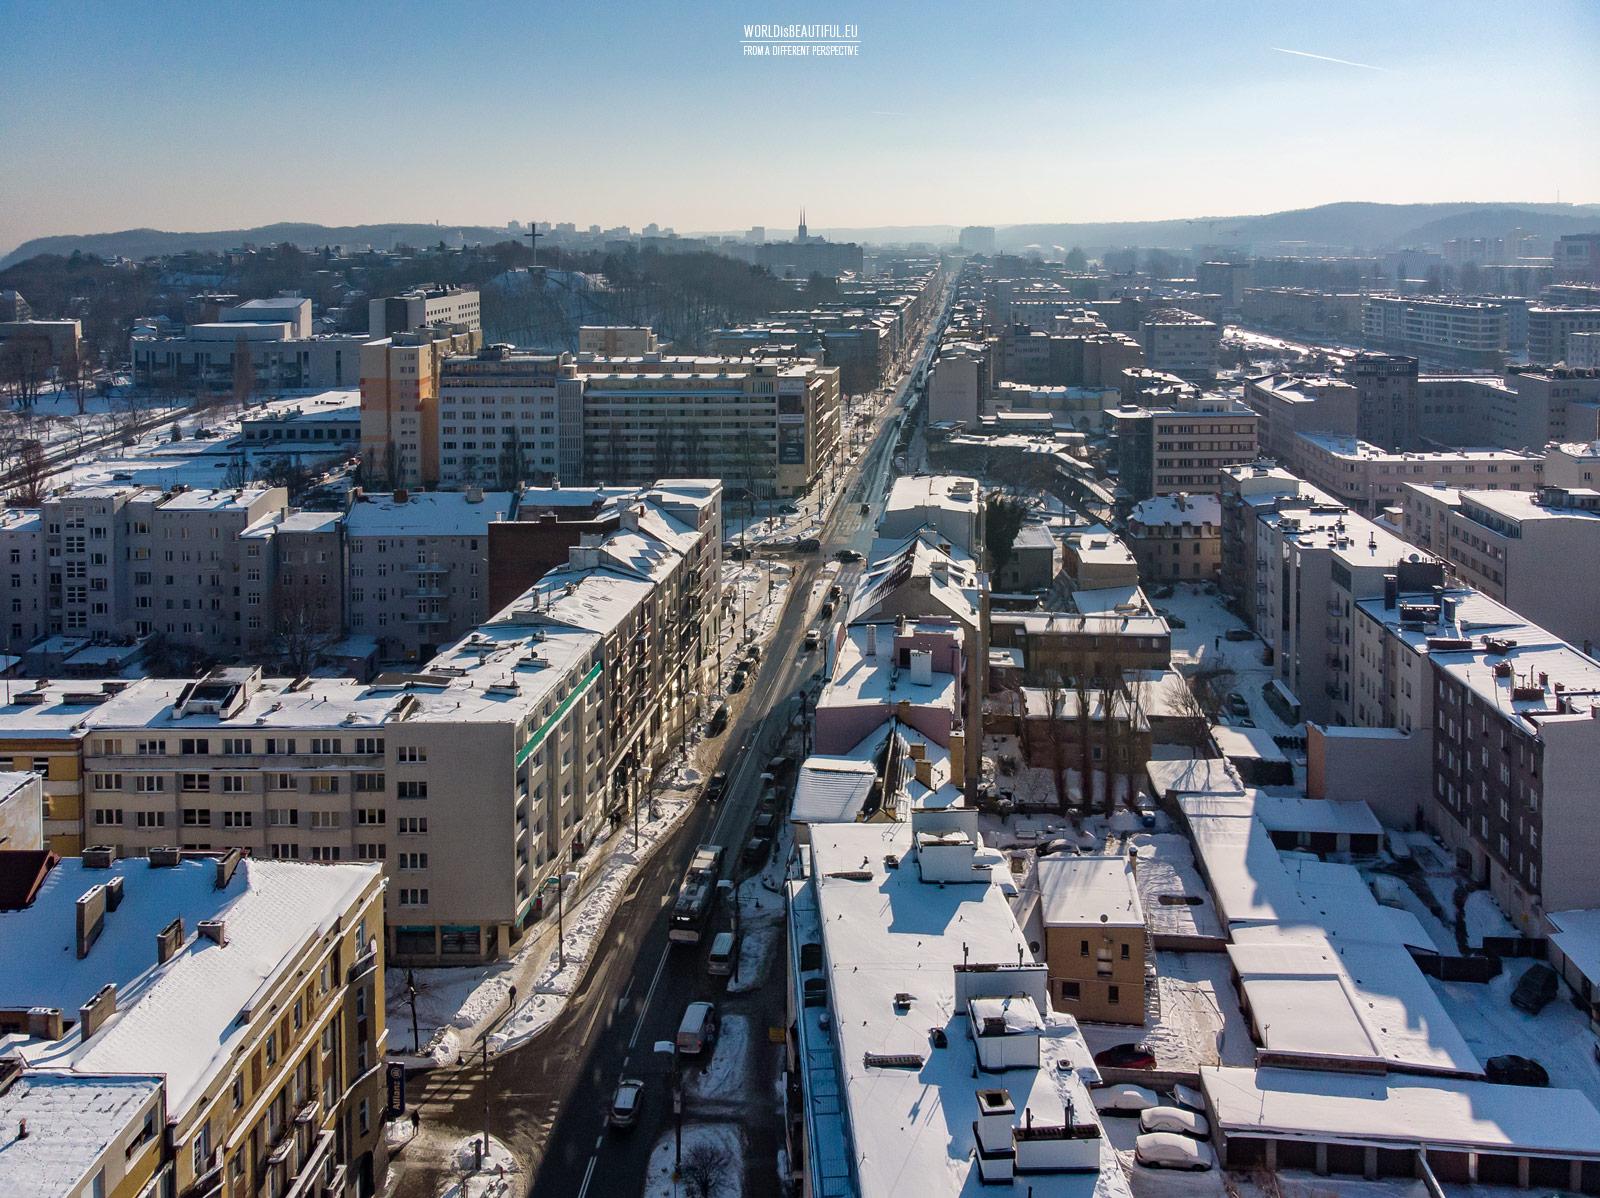 Świętojańska Street in Gdynia